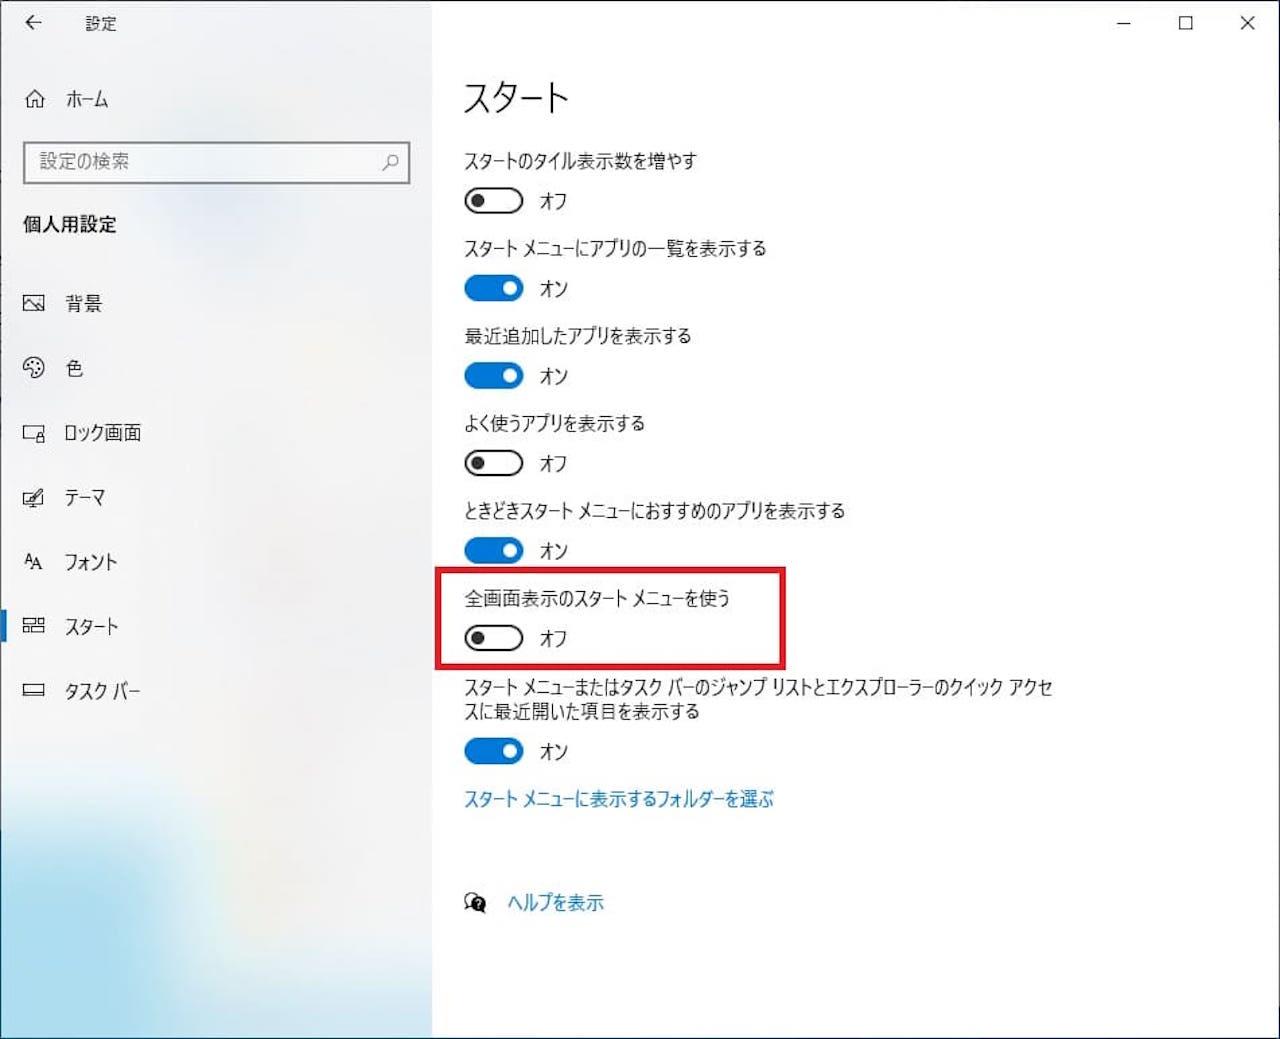 Windows10でスタートメニューの全画面表示を解除する方法⑥